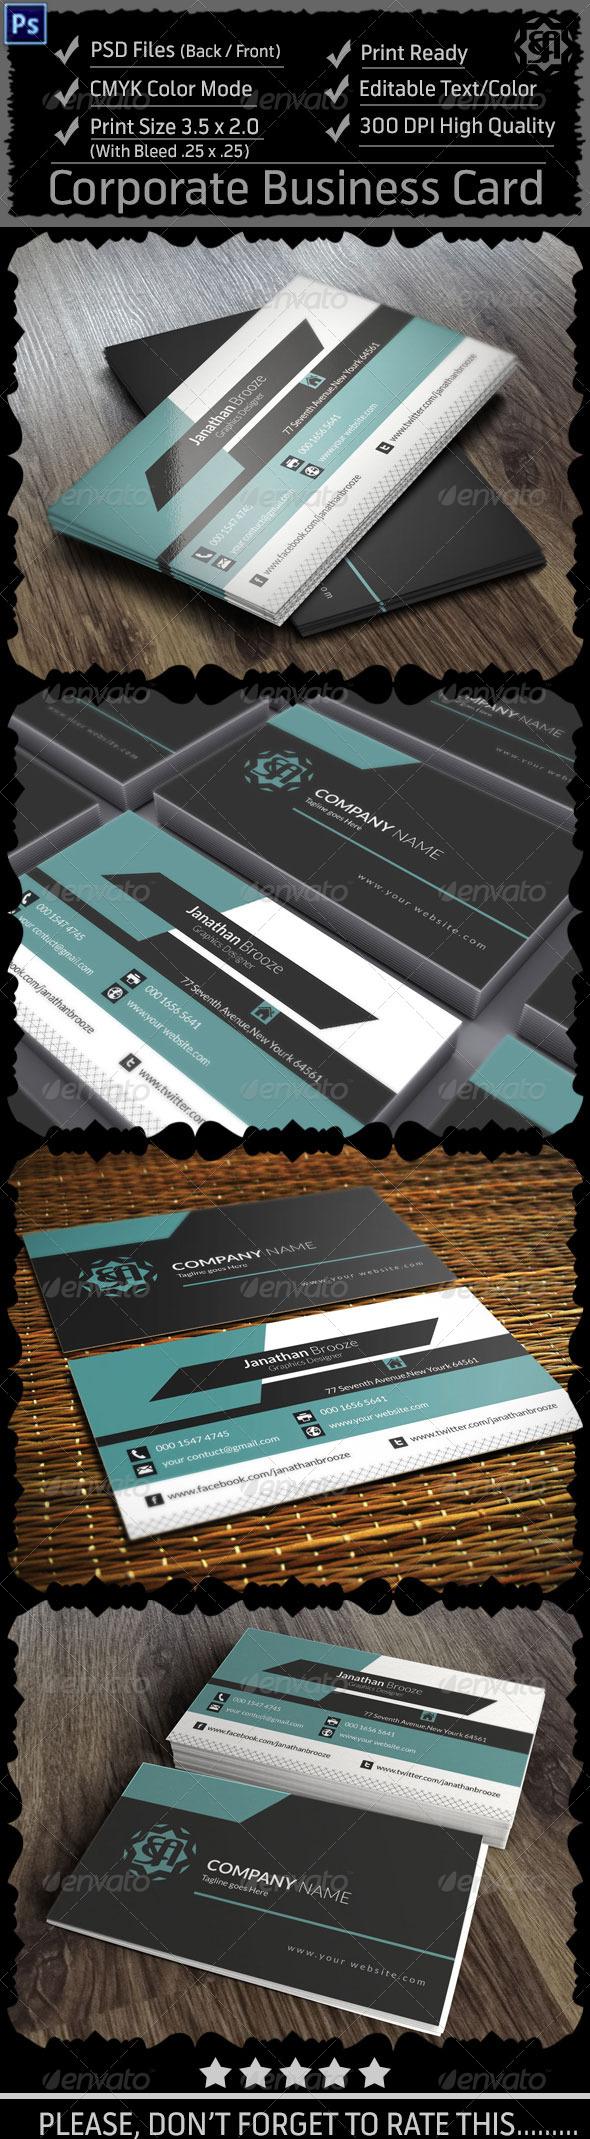 GraphicRiver Corporate Business Card Vol 9 8546374